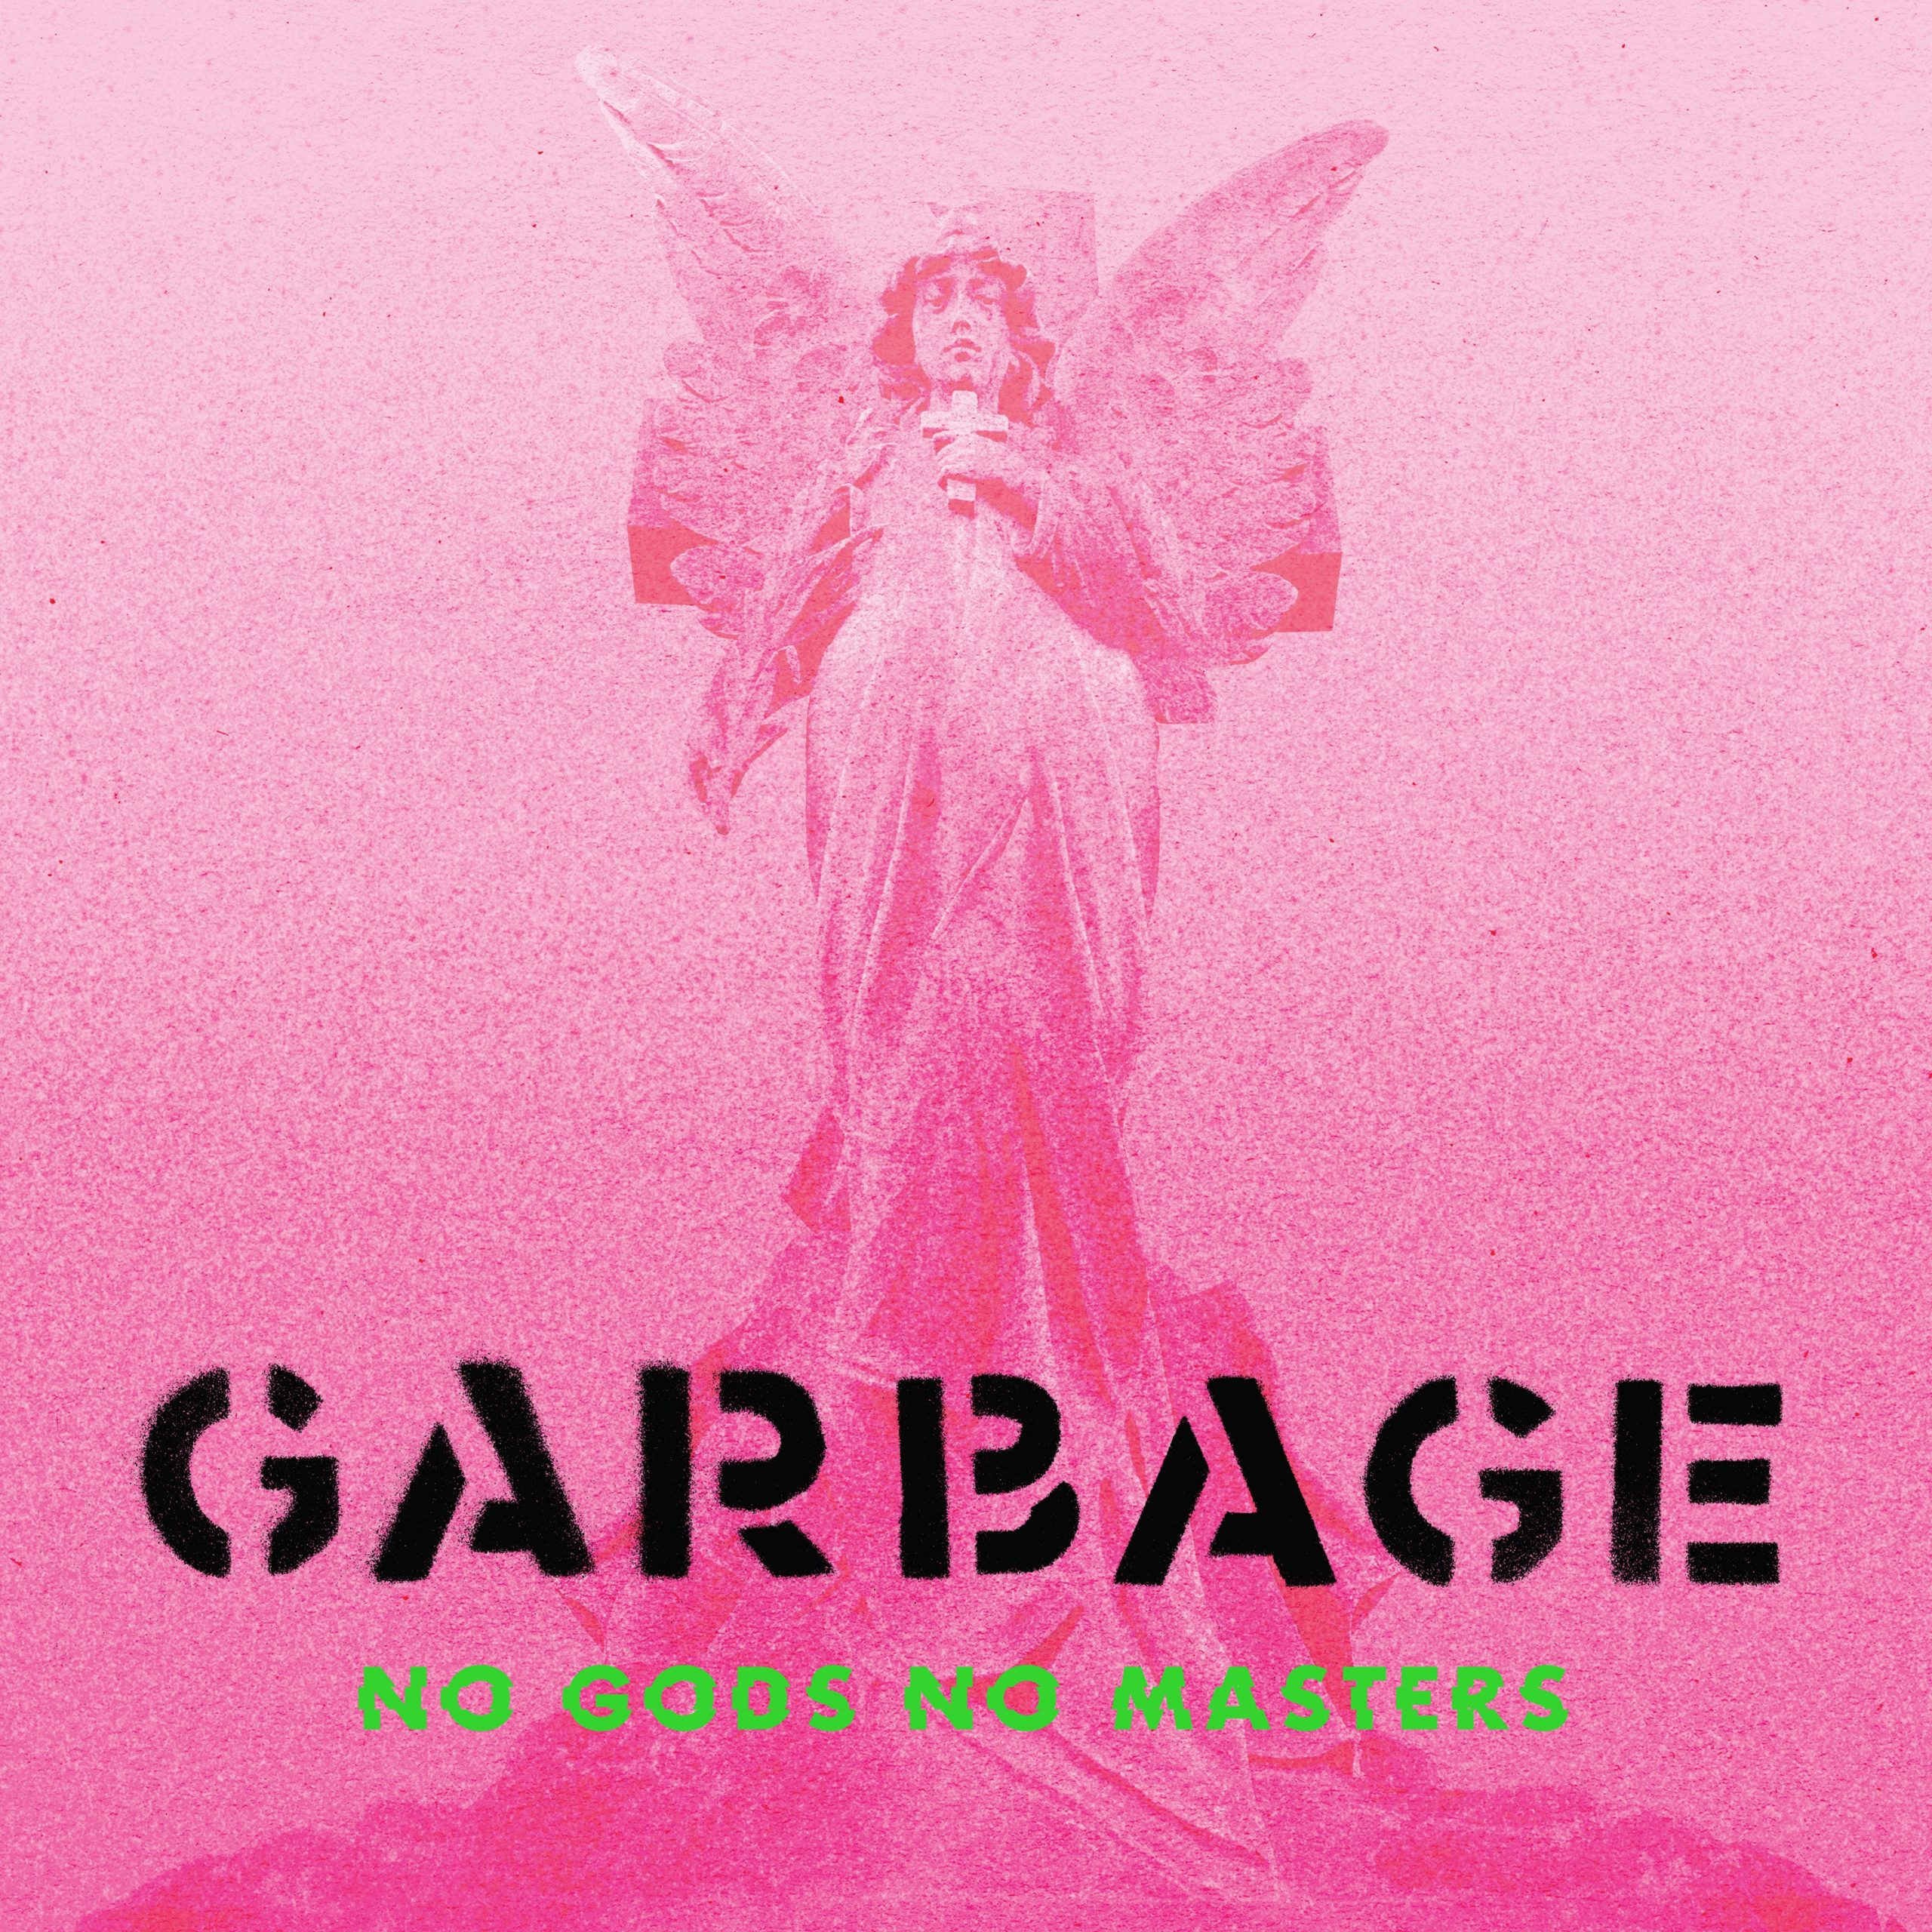 Garbage's 2021 Album 'No Gods No Masters' cover art